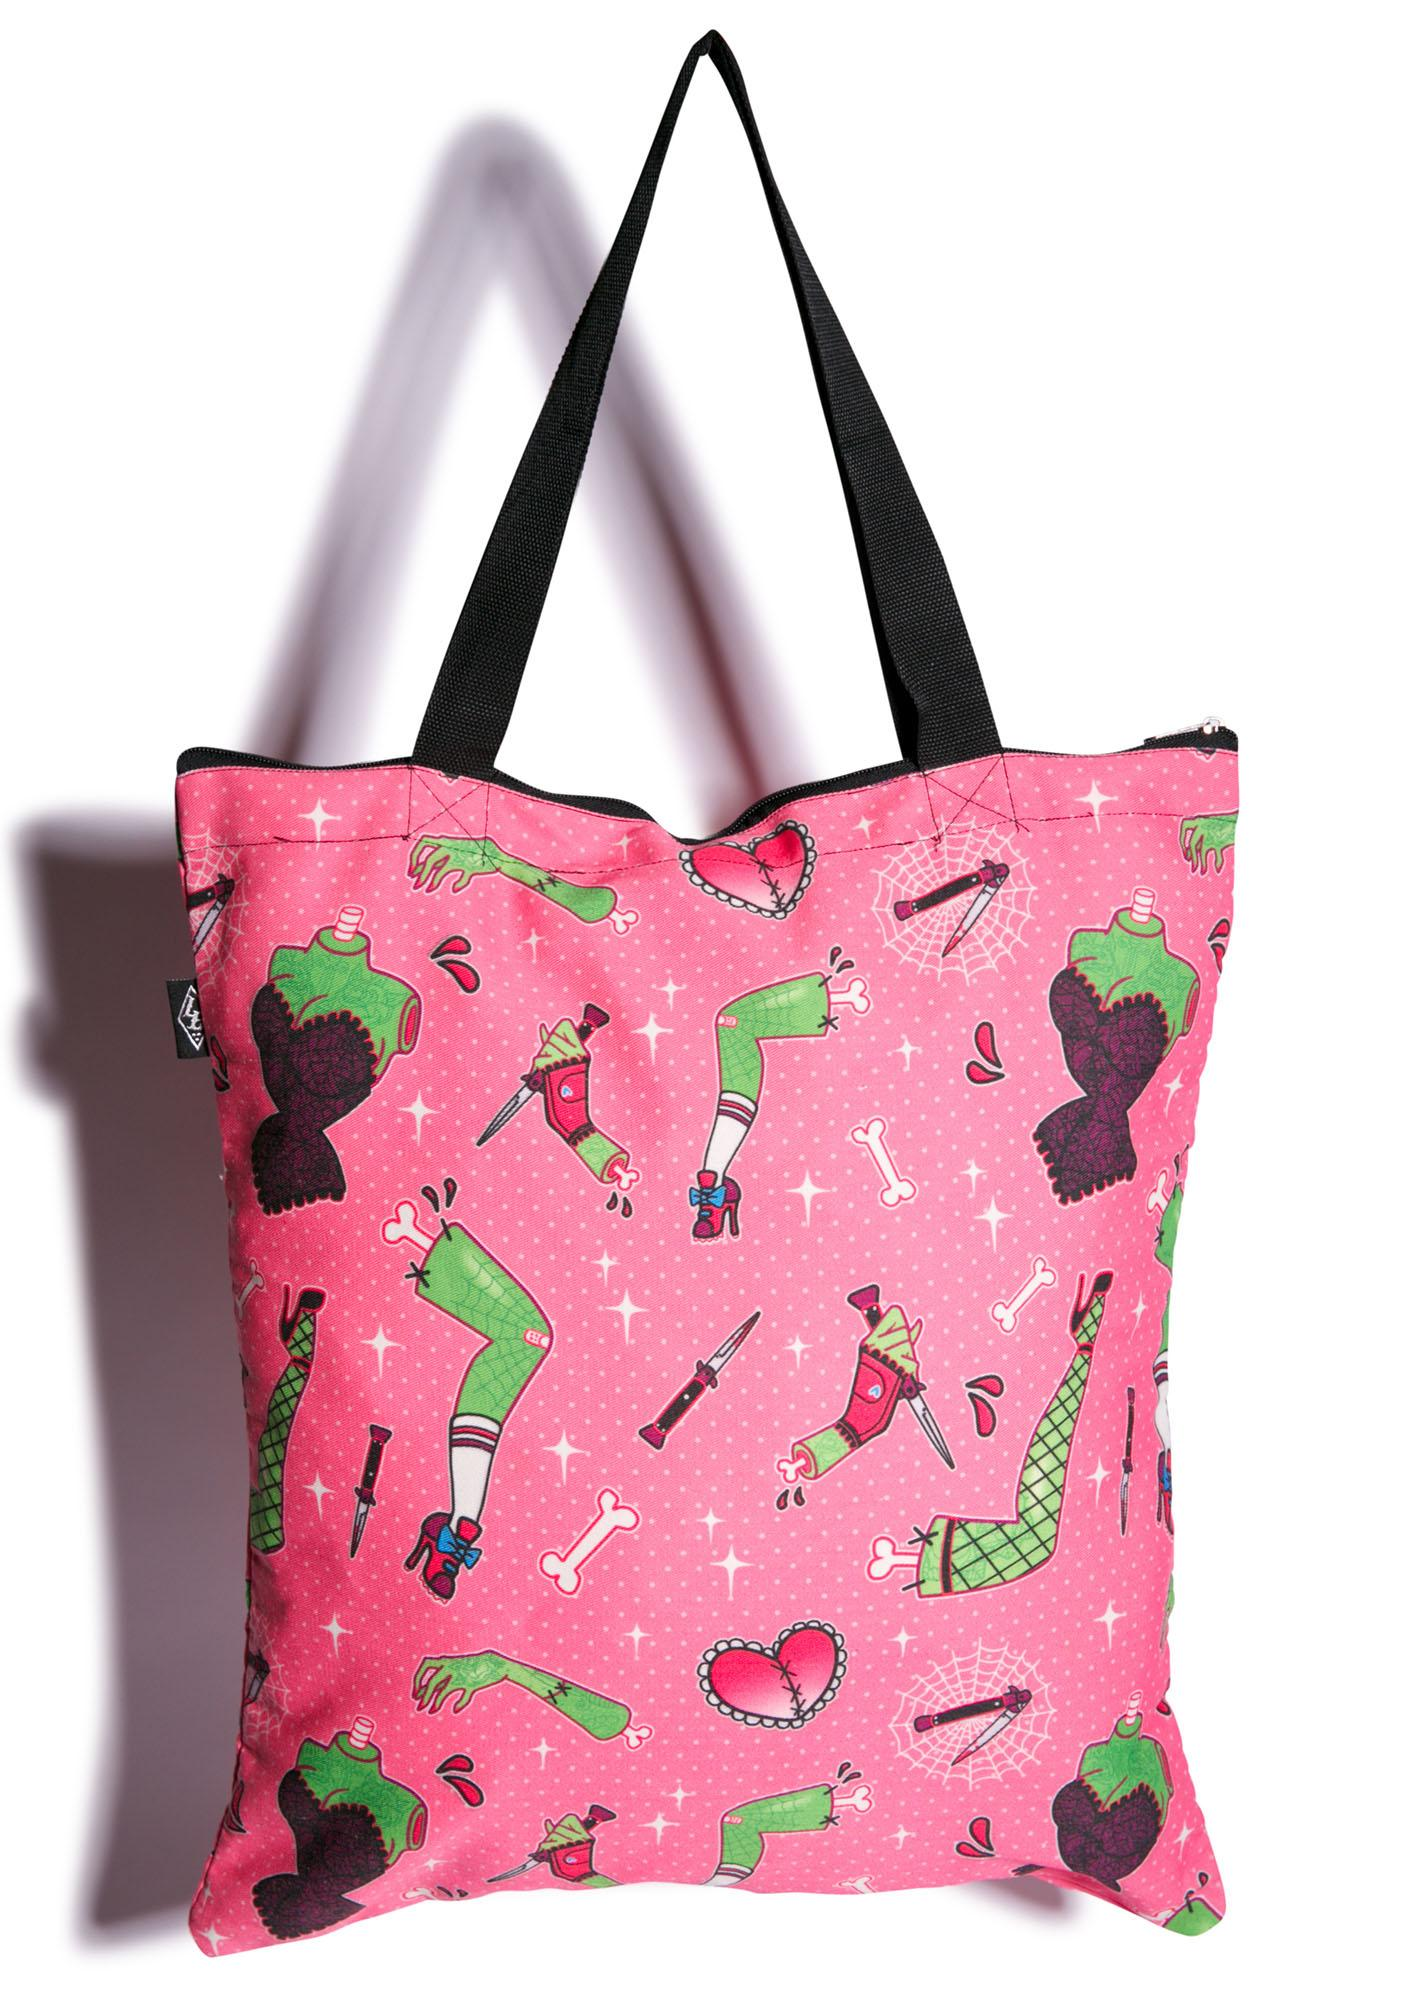 Bits N' Pieces Tote Bag